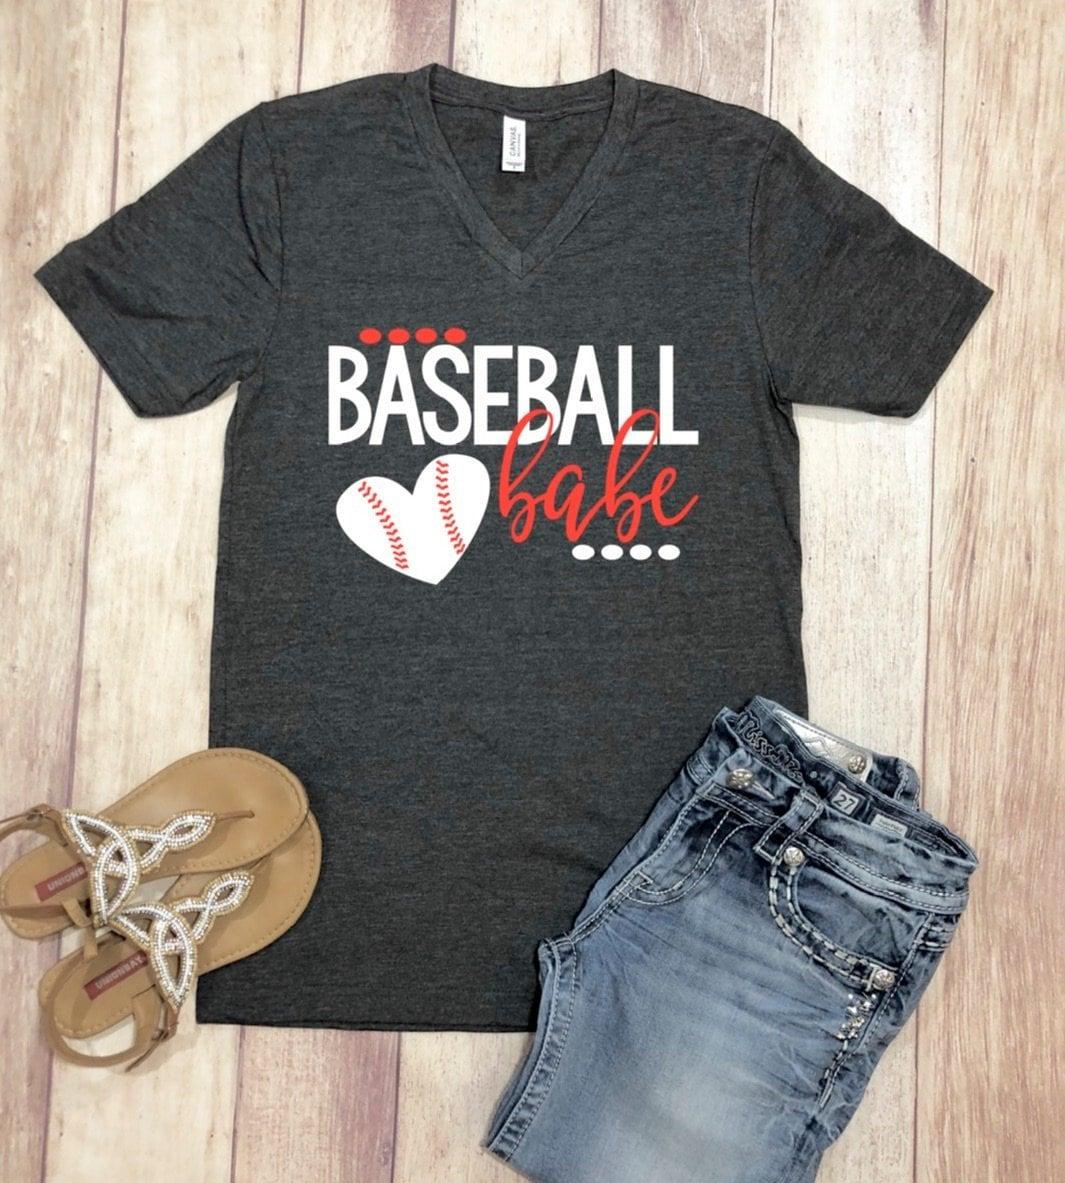 c94cce473 Baseball Babe shirt, Baseball Wife Shirt, Baseball Babe Tshirt ...